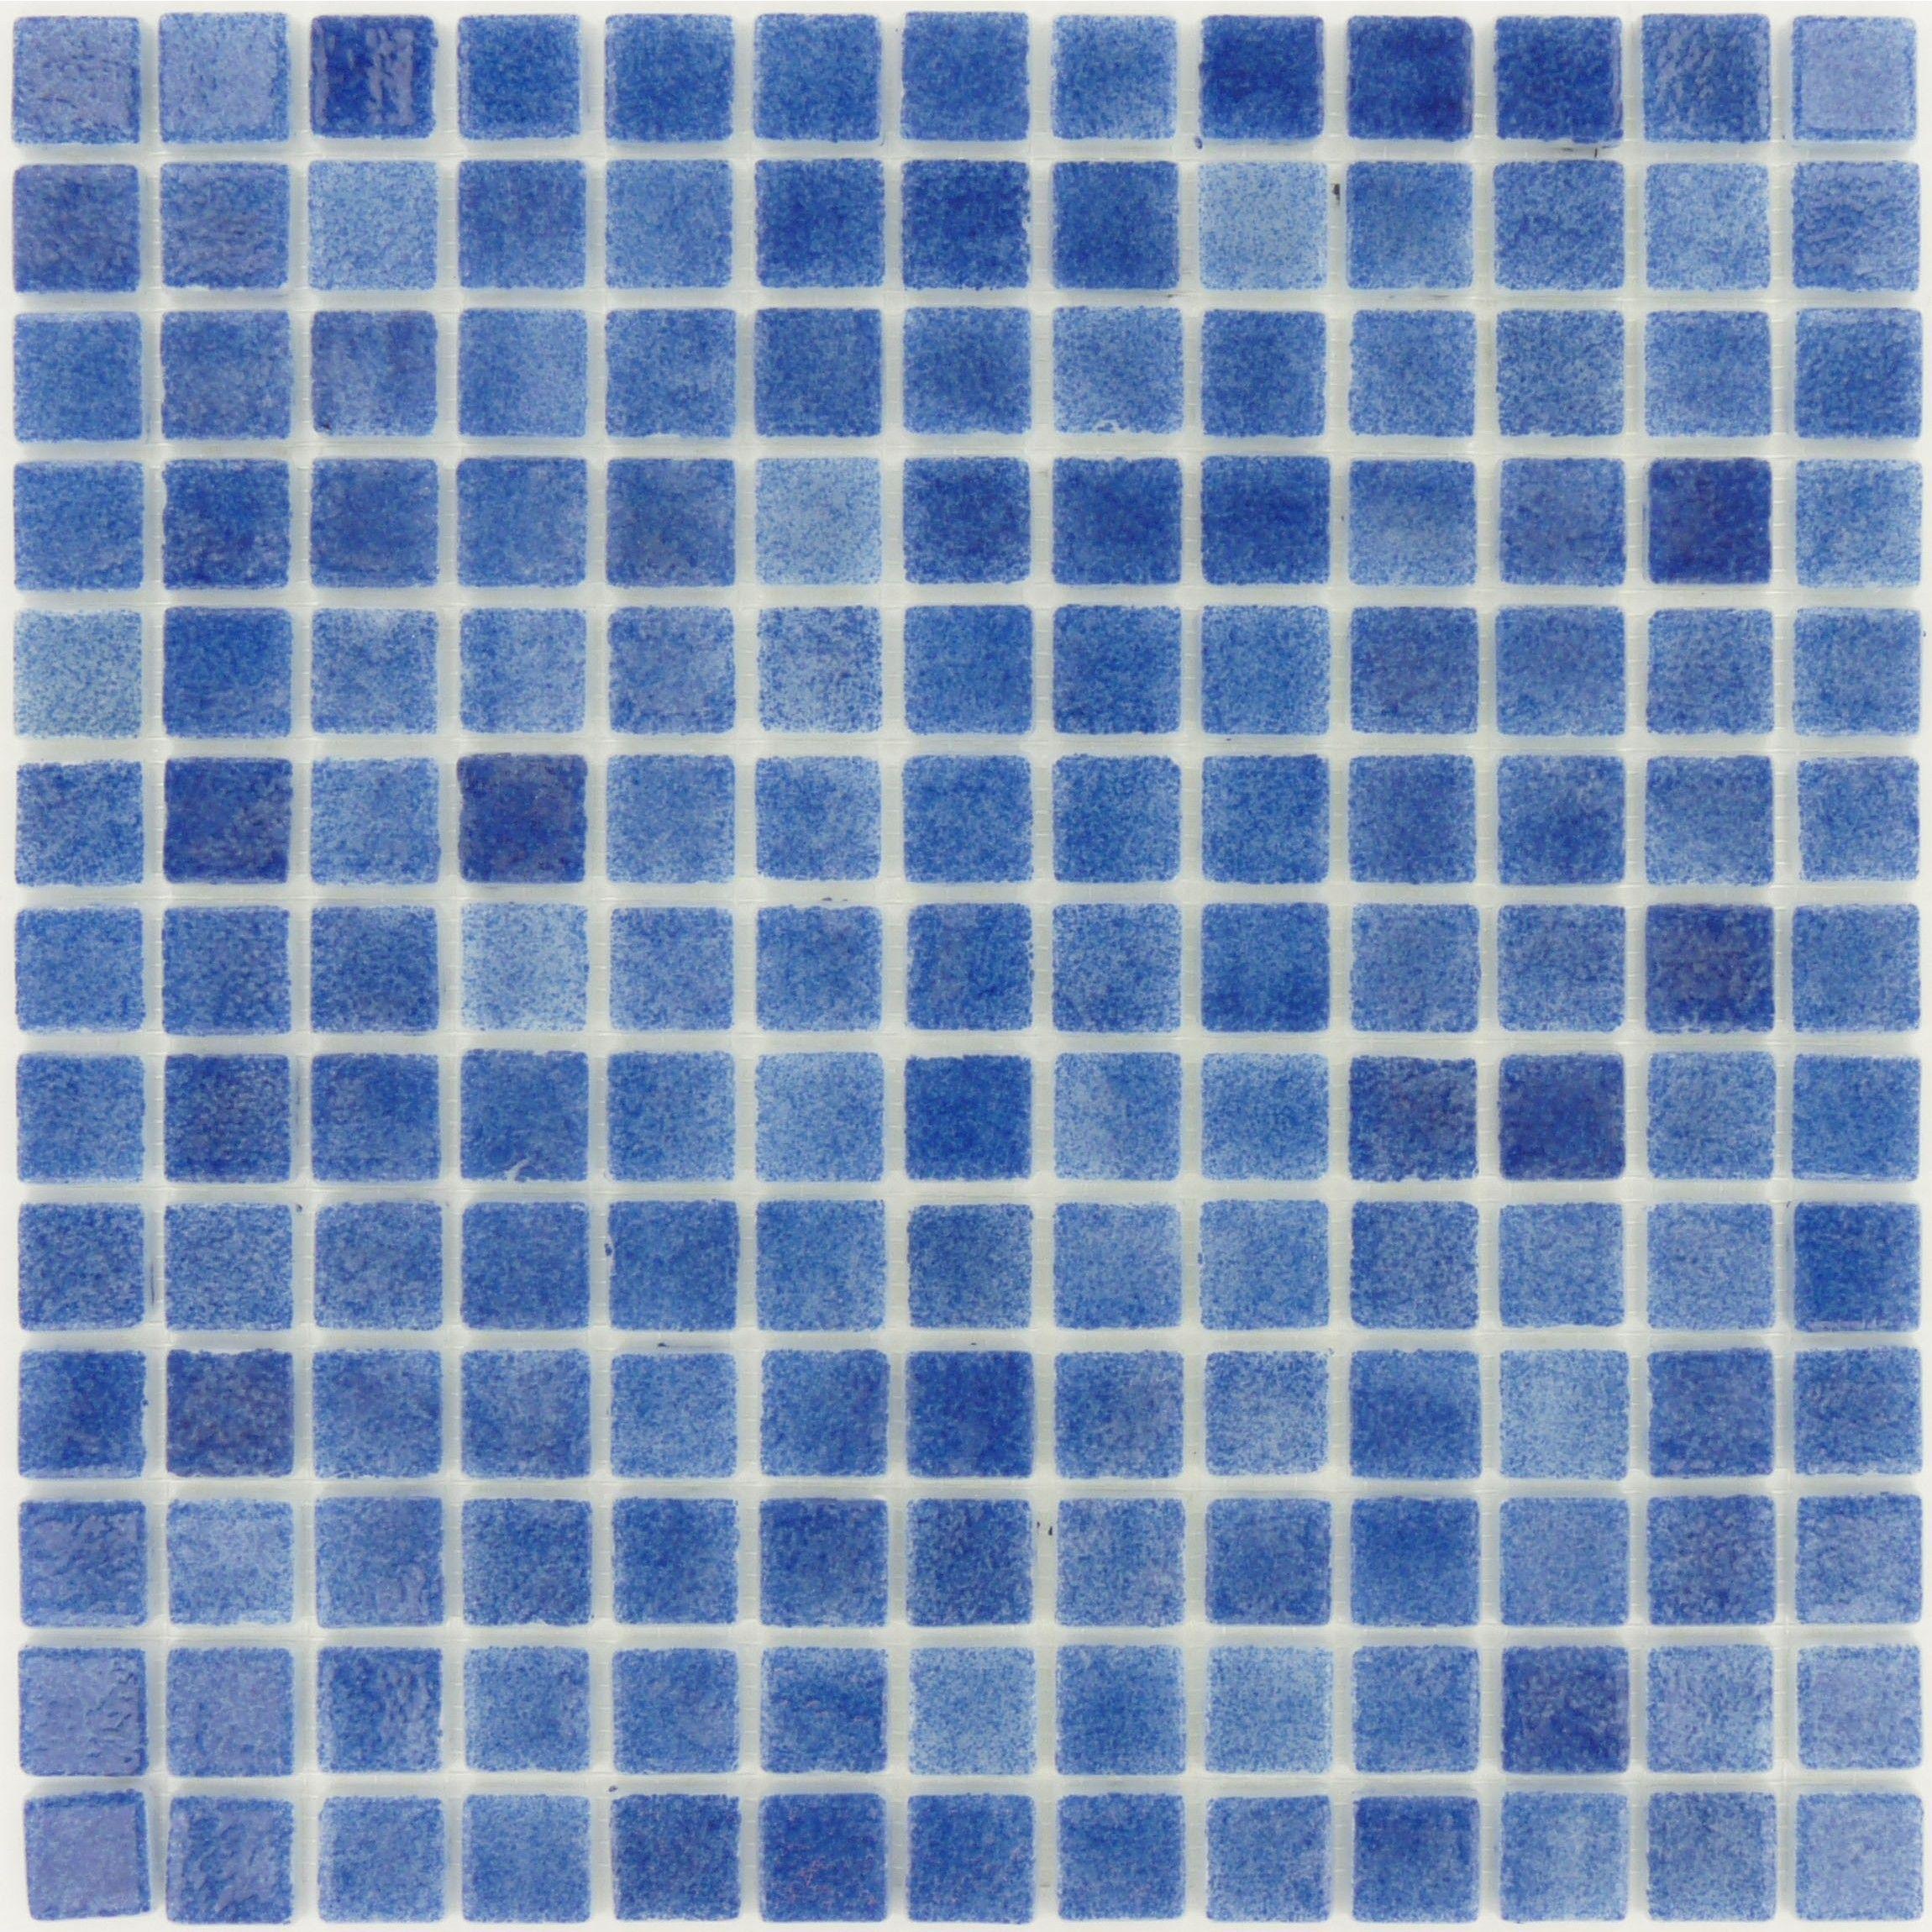 Azul Blue 7/8\'\' x 7/8\'\' Glass Glossy Tile   Glass design, Kitchen ...